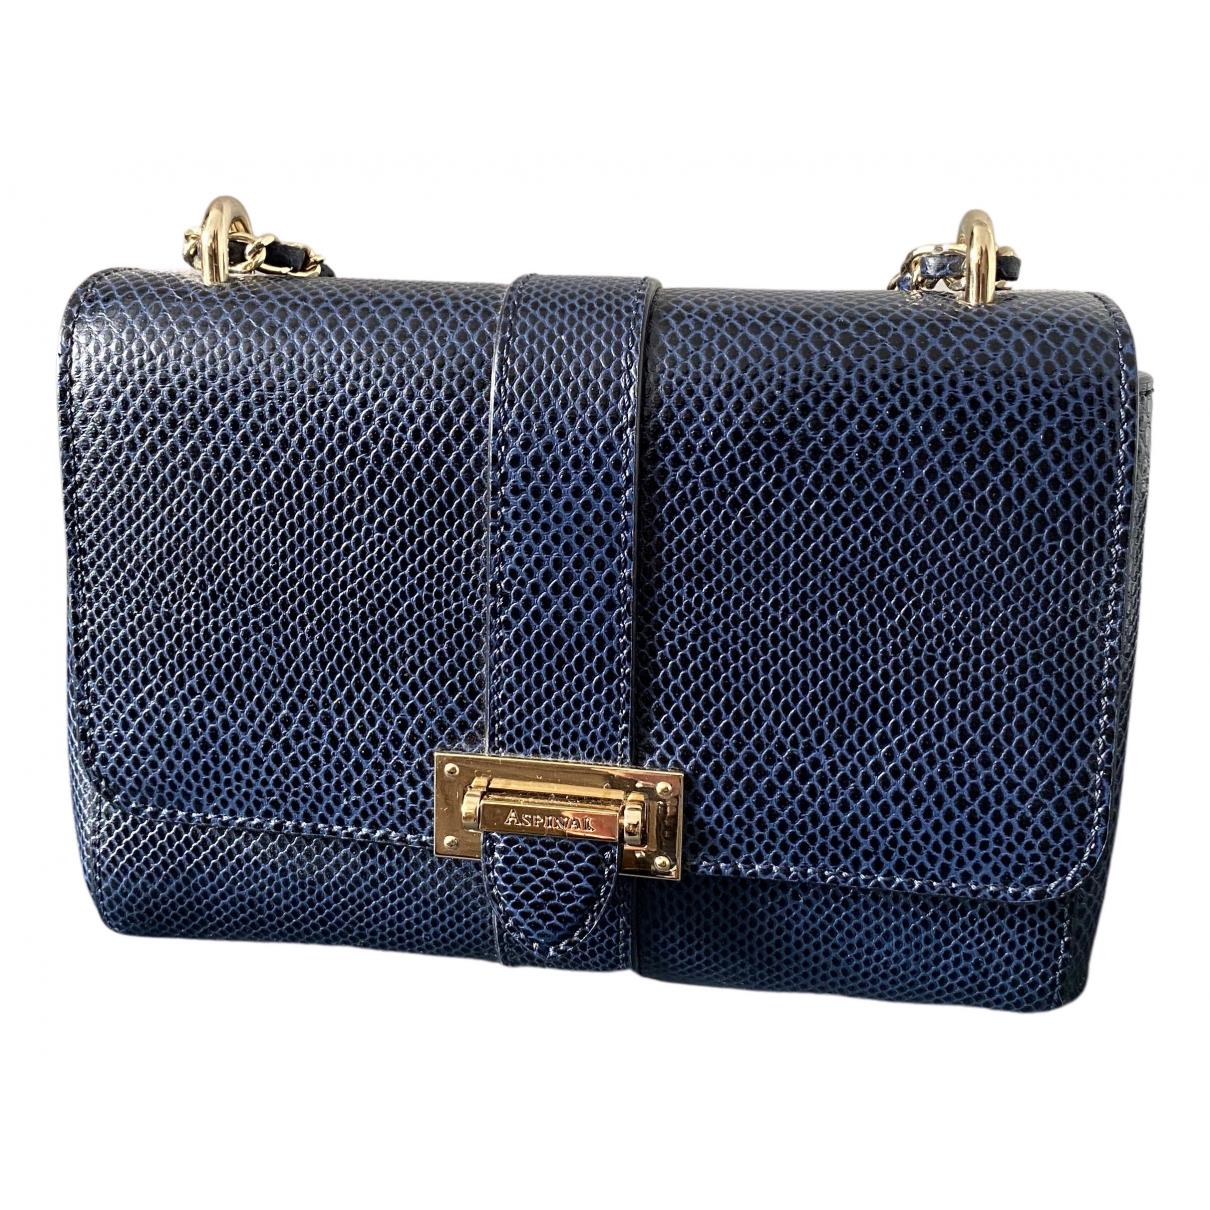 Aspinal Of London - Sac a main   pour femme en cuir - bleu